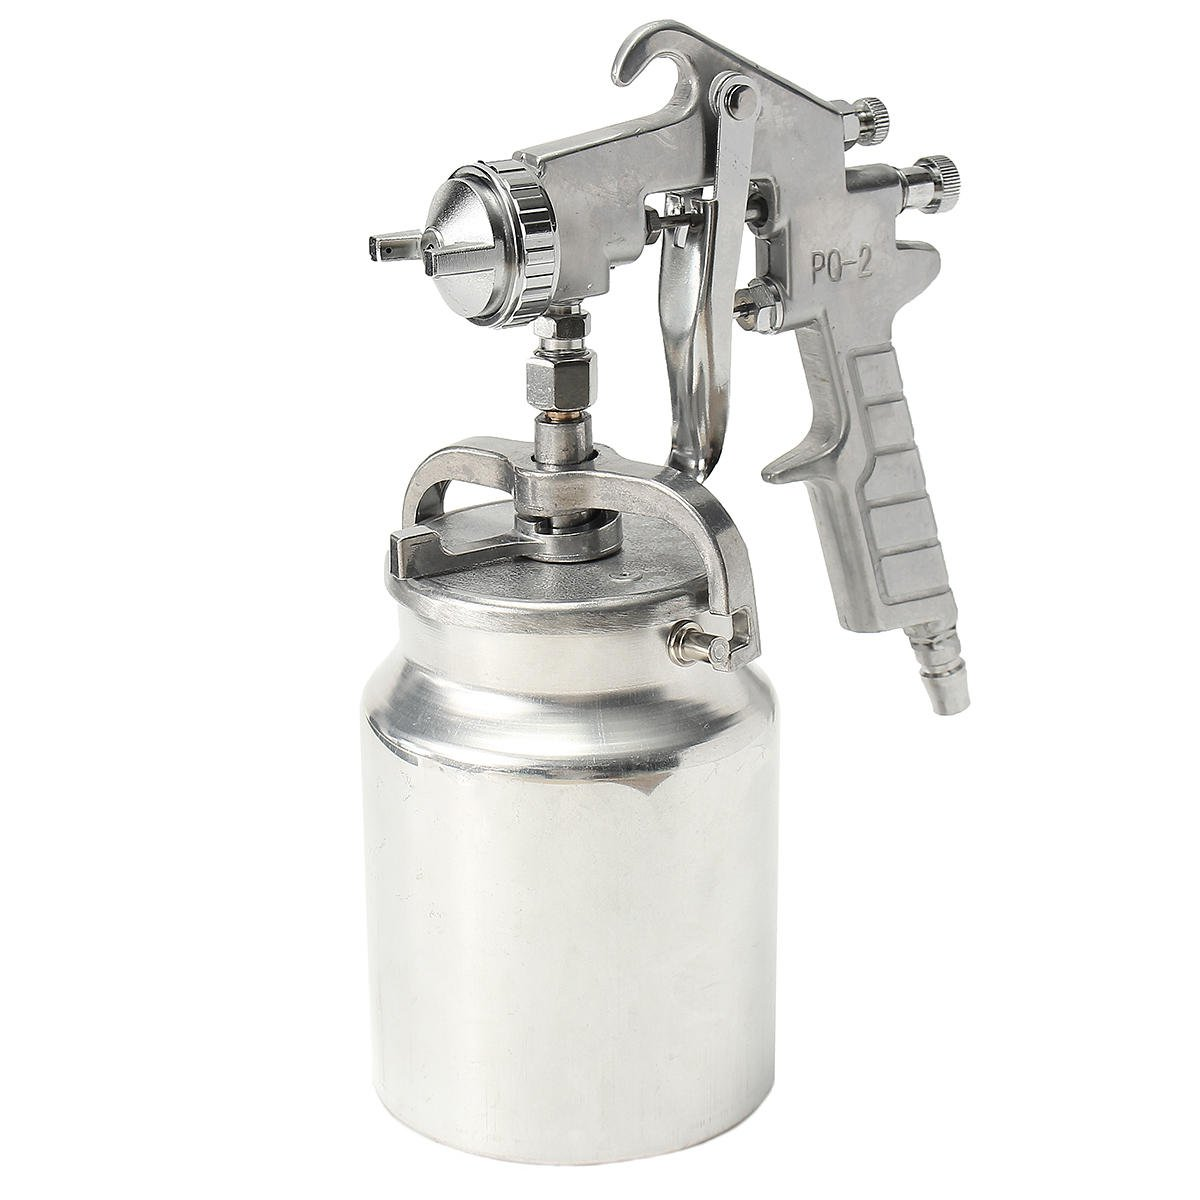 Heavy Duty Painting Spray G un Air Sprayer Paint 2.0mm Nozzle Suction Feed 1L Pot